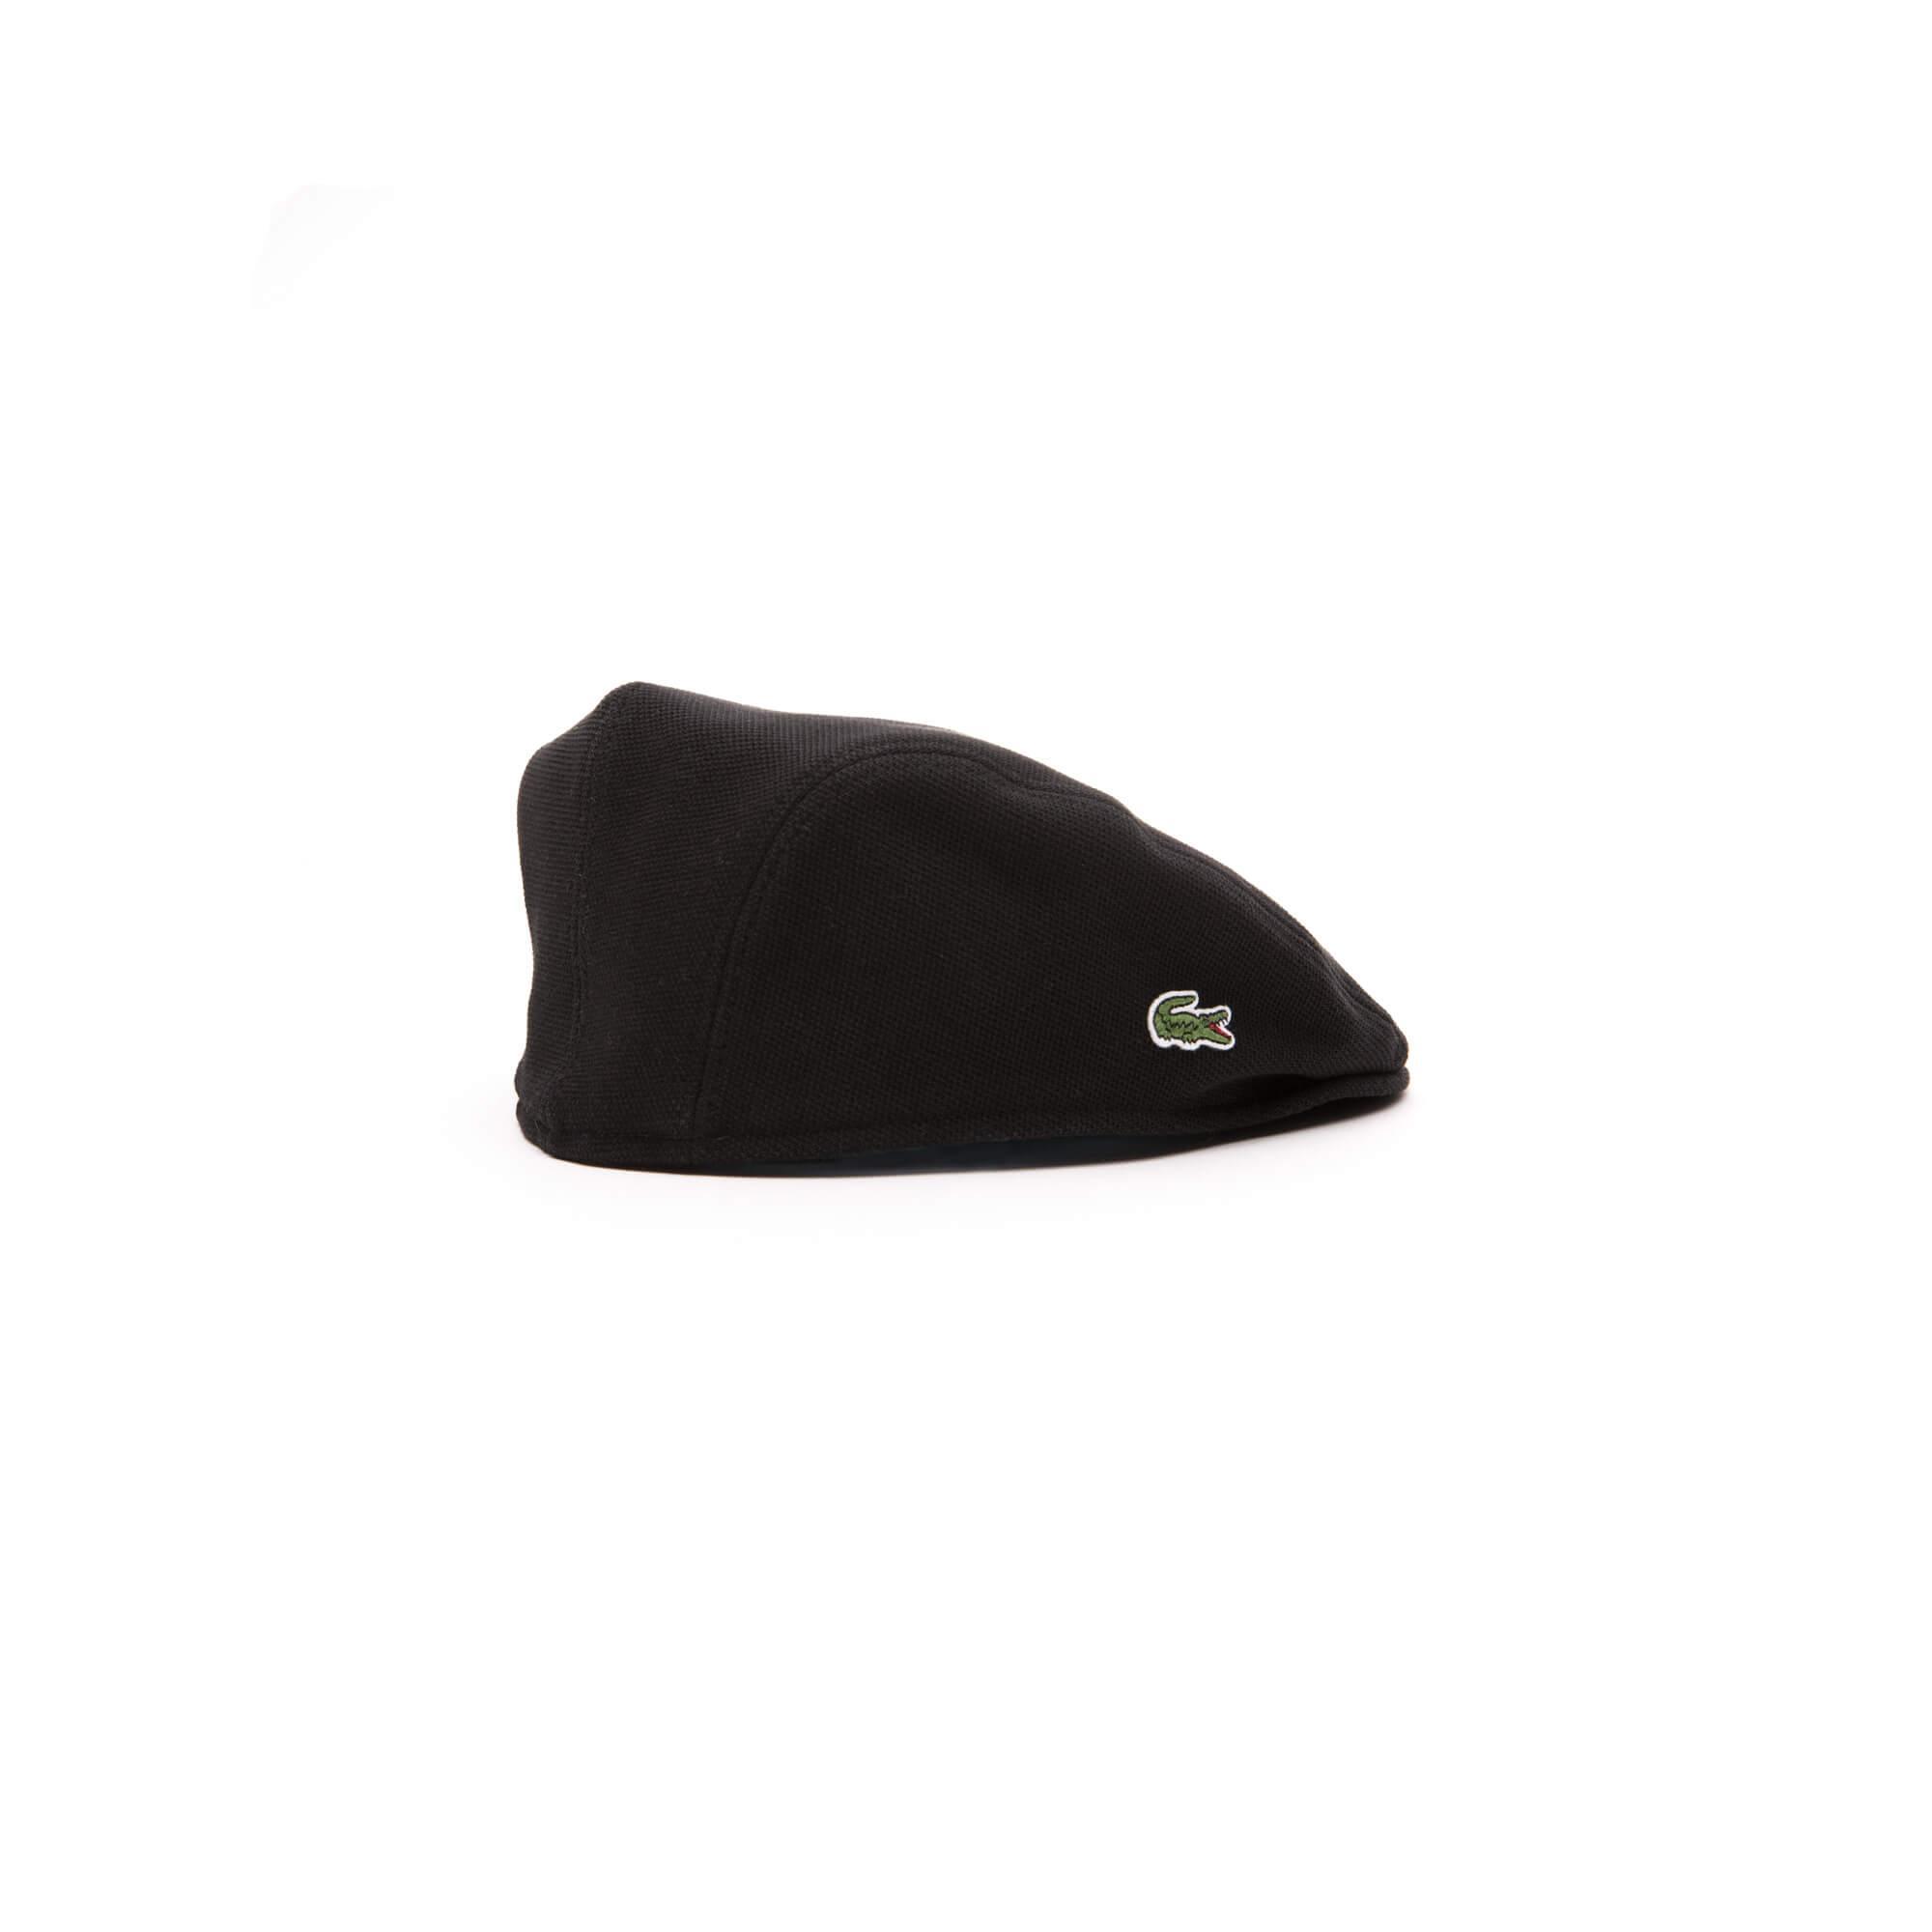 1c351f19387 Lacoste Erkek Siyah Şapka RK0345-031